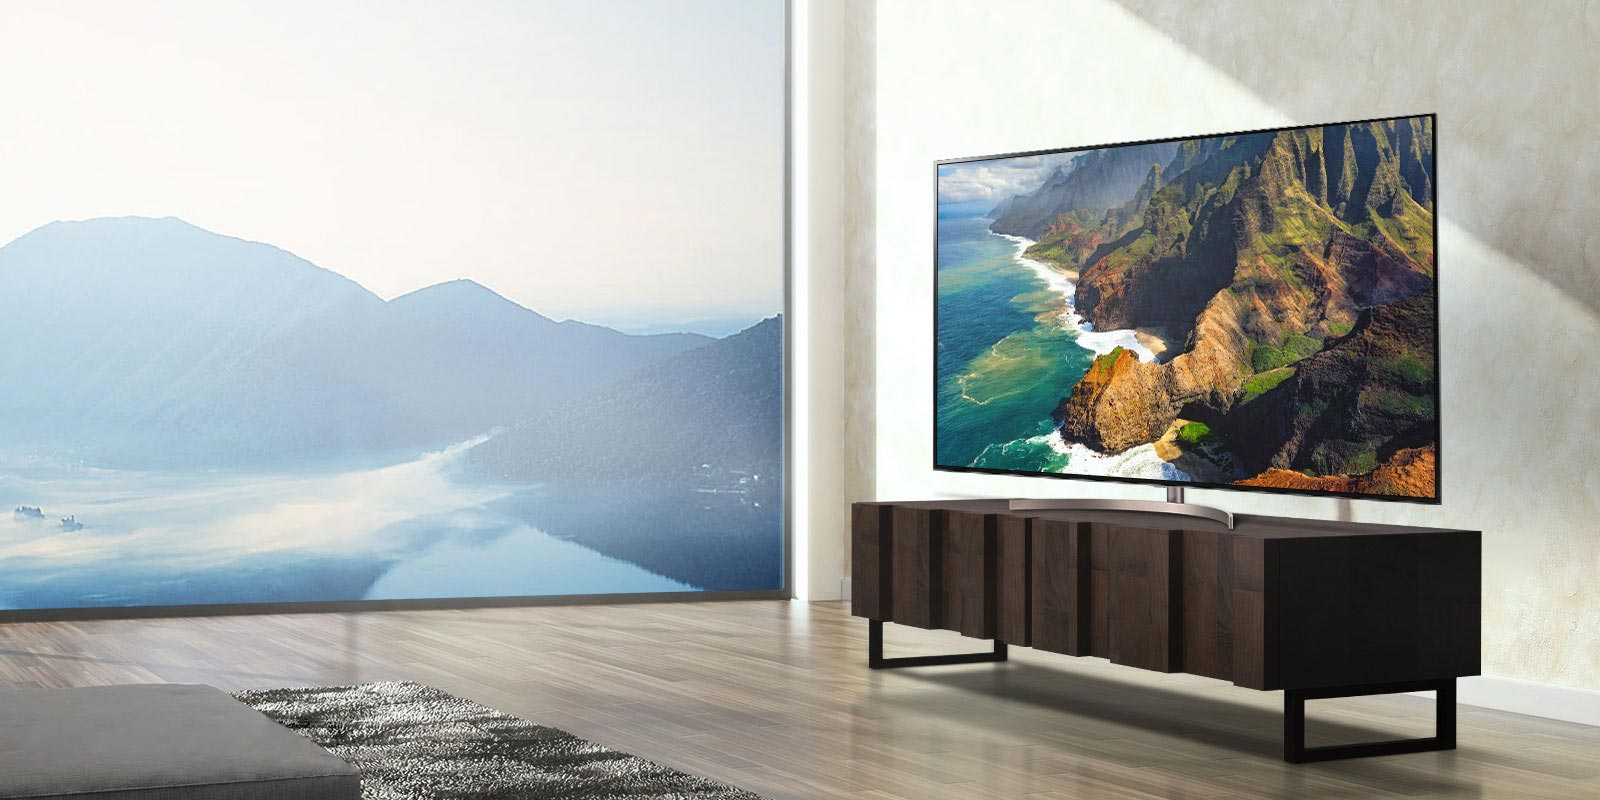 تلویزیون 55 اینچ ال جی مدل 55UN7440